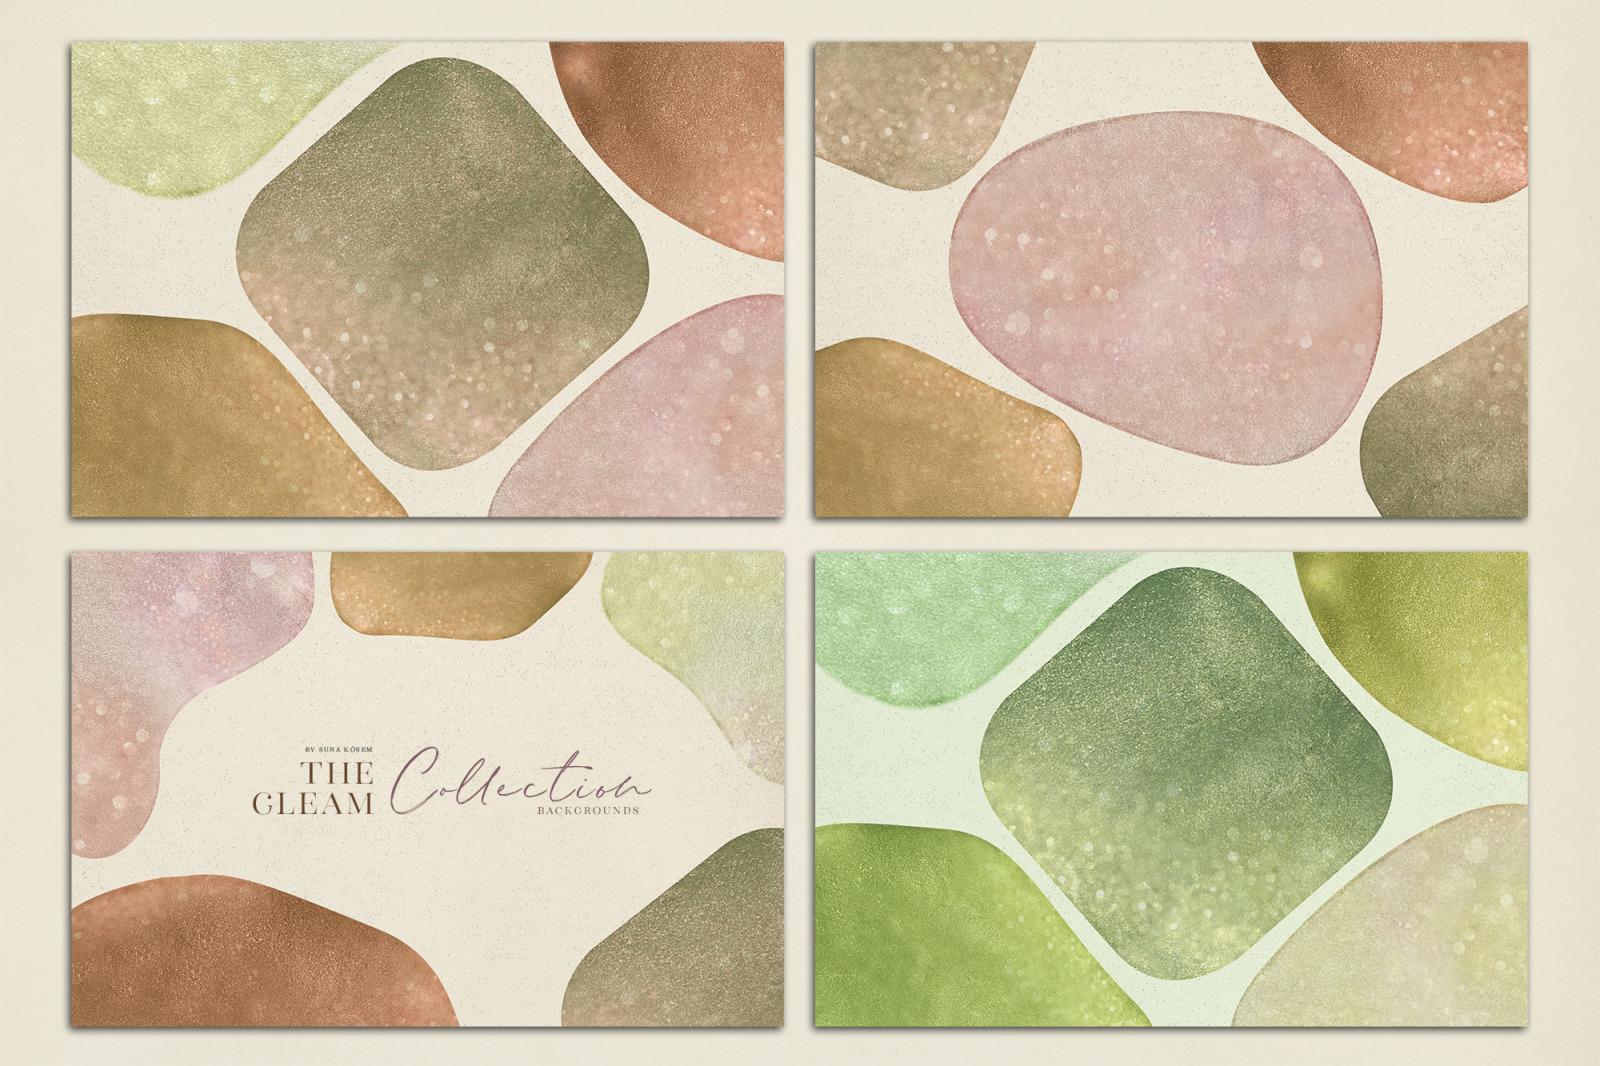 抽象闪闪发光水彩背景图片设计素材 The Gleam Watercolor Shapes插图6